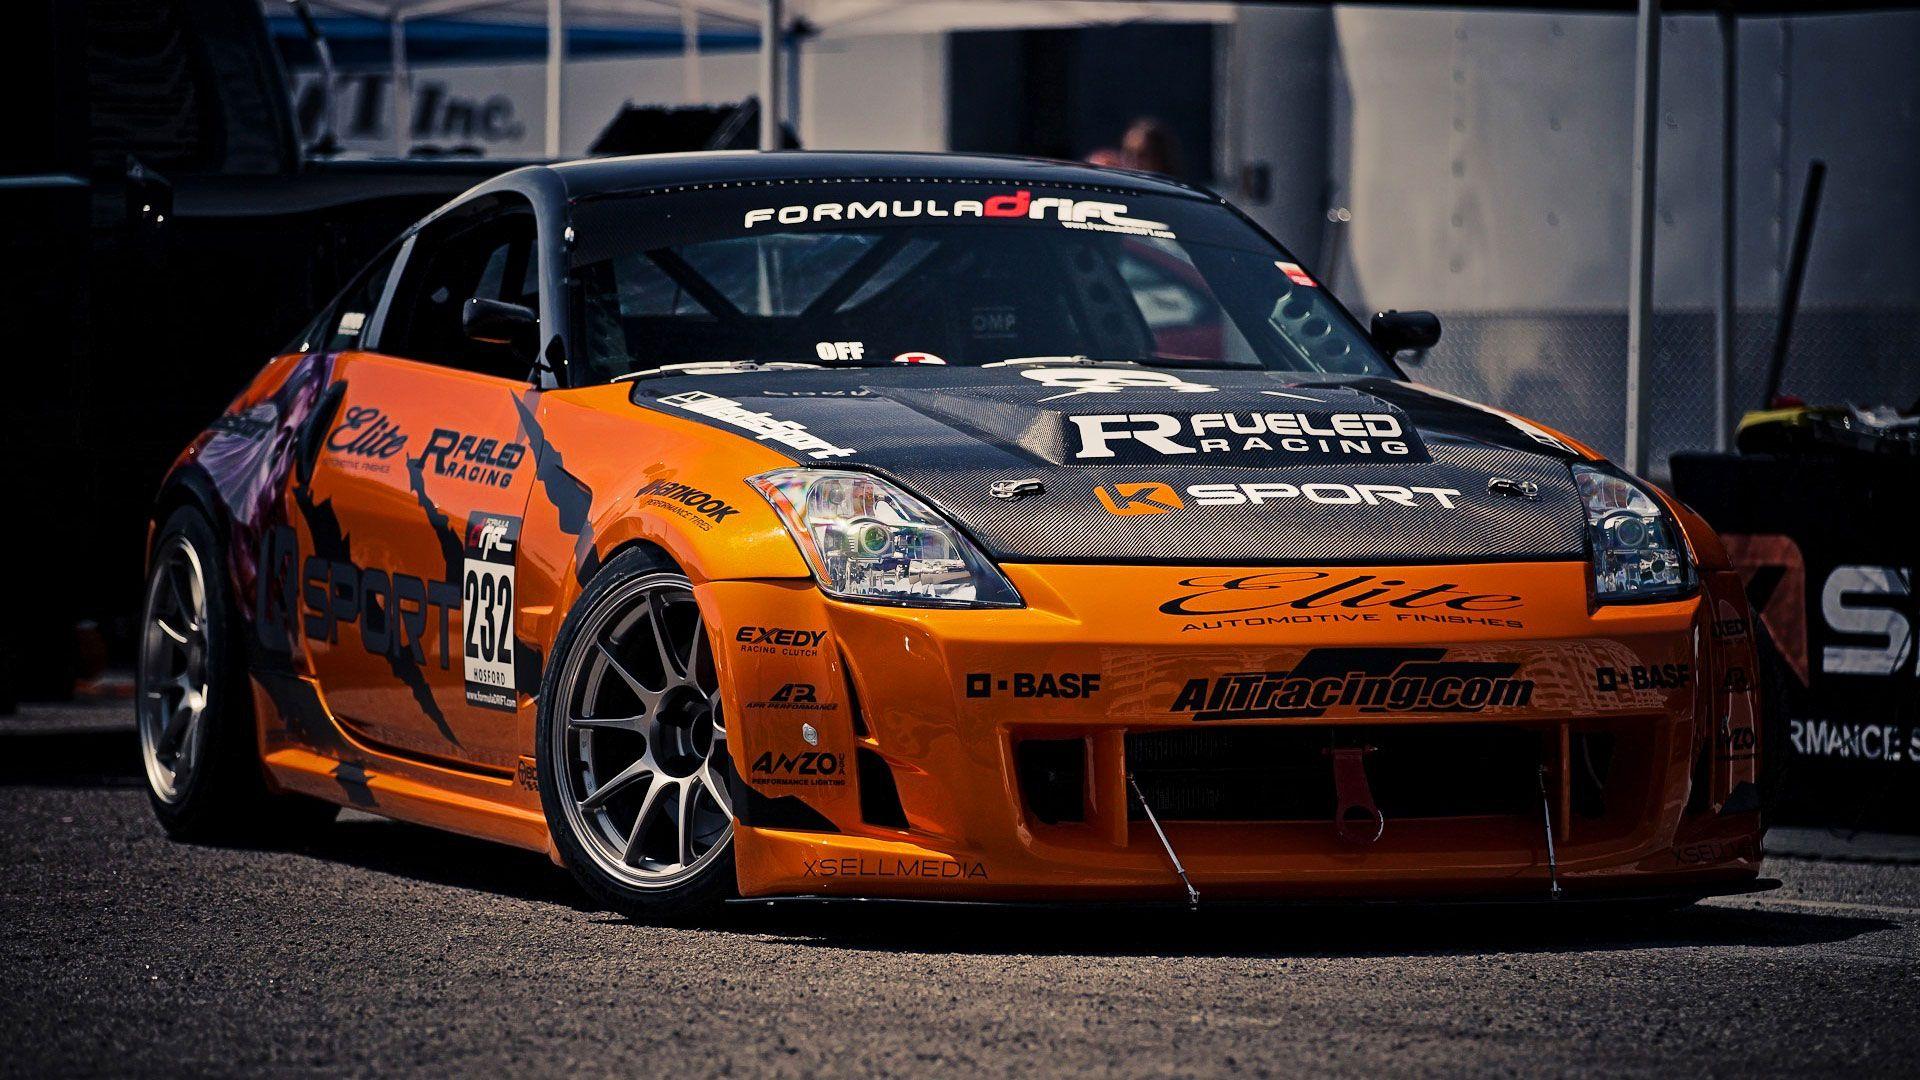 Drift Racing Cars Nissan Formula Drift Race Car Full Hd